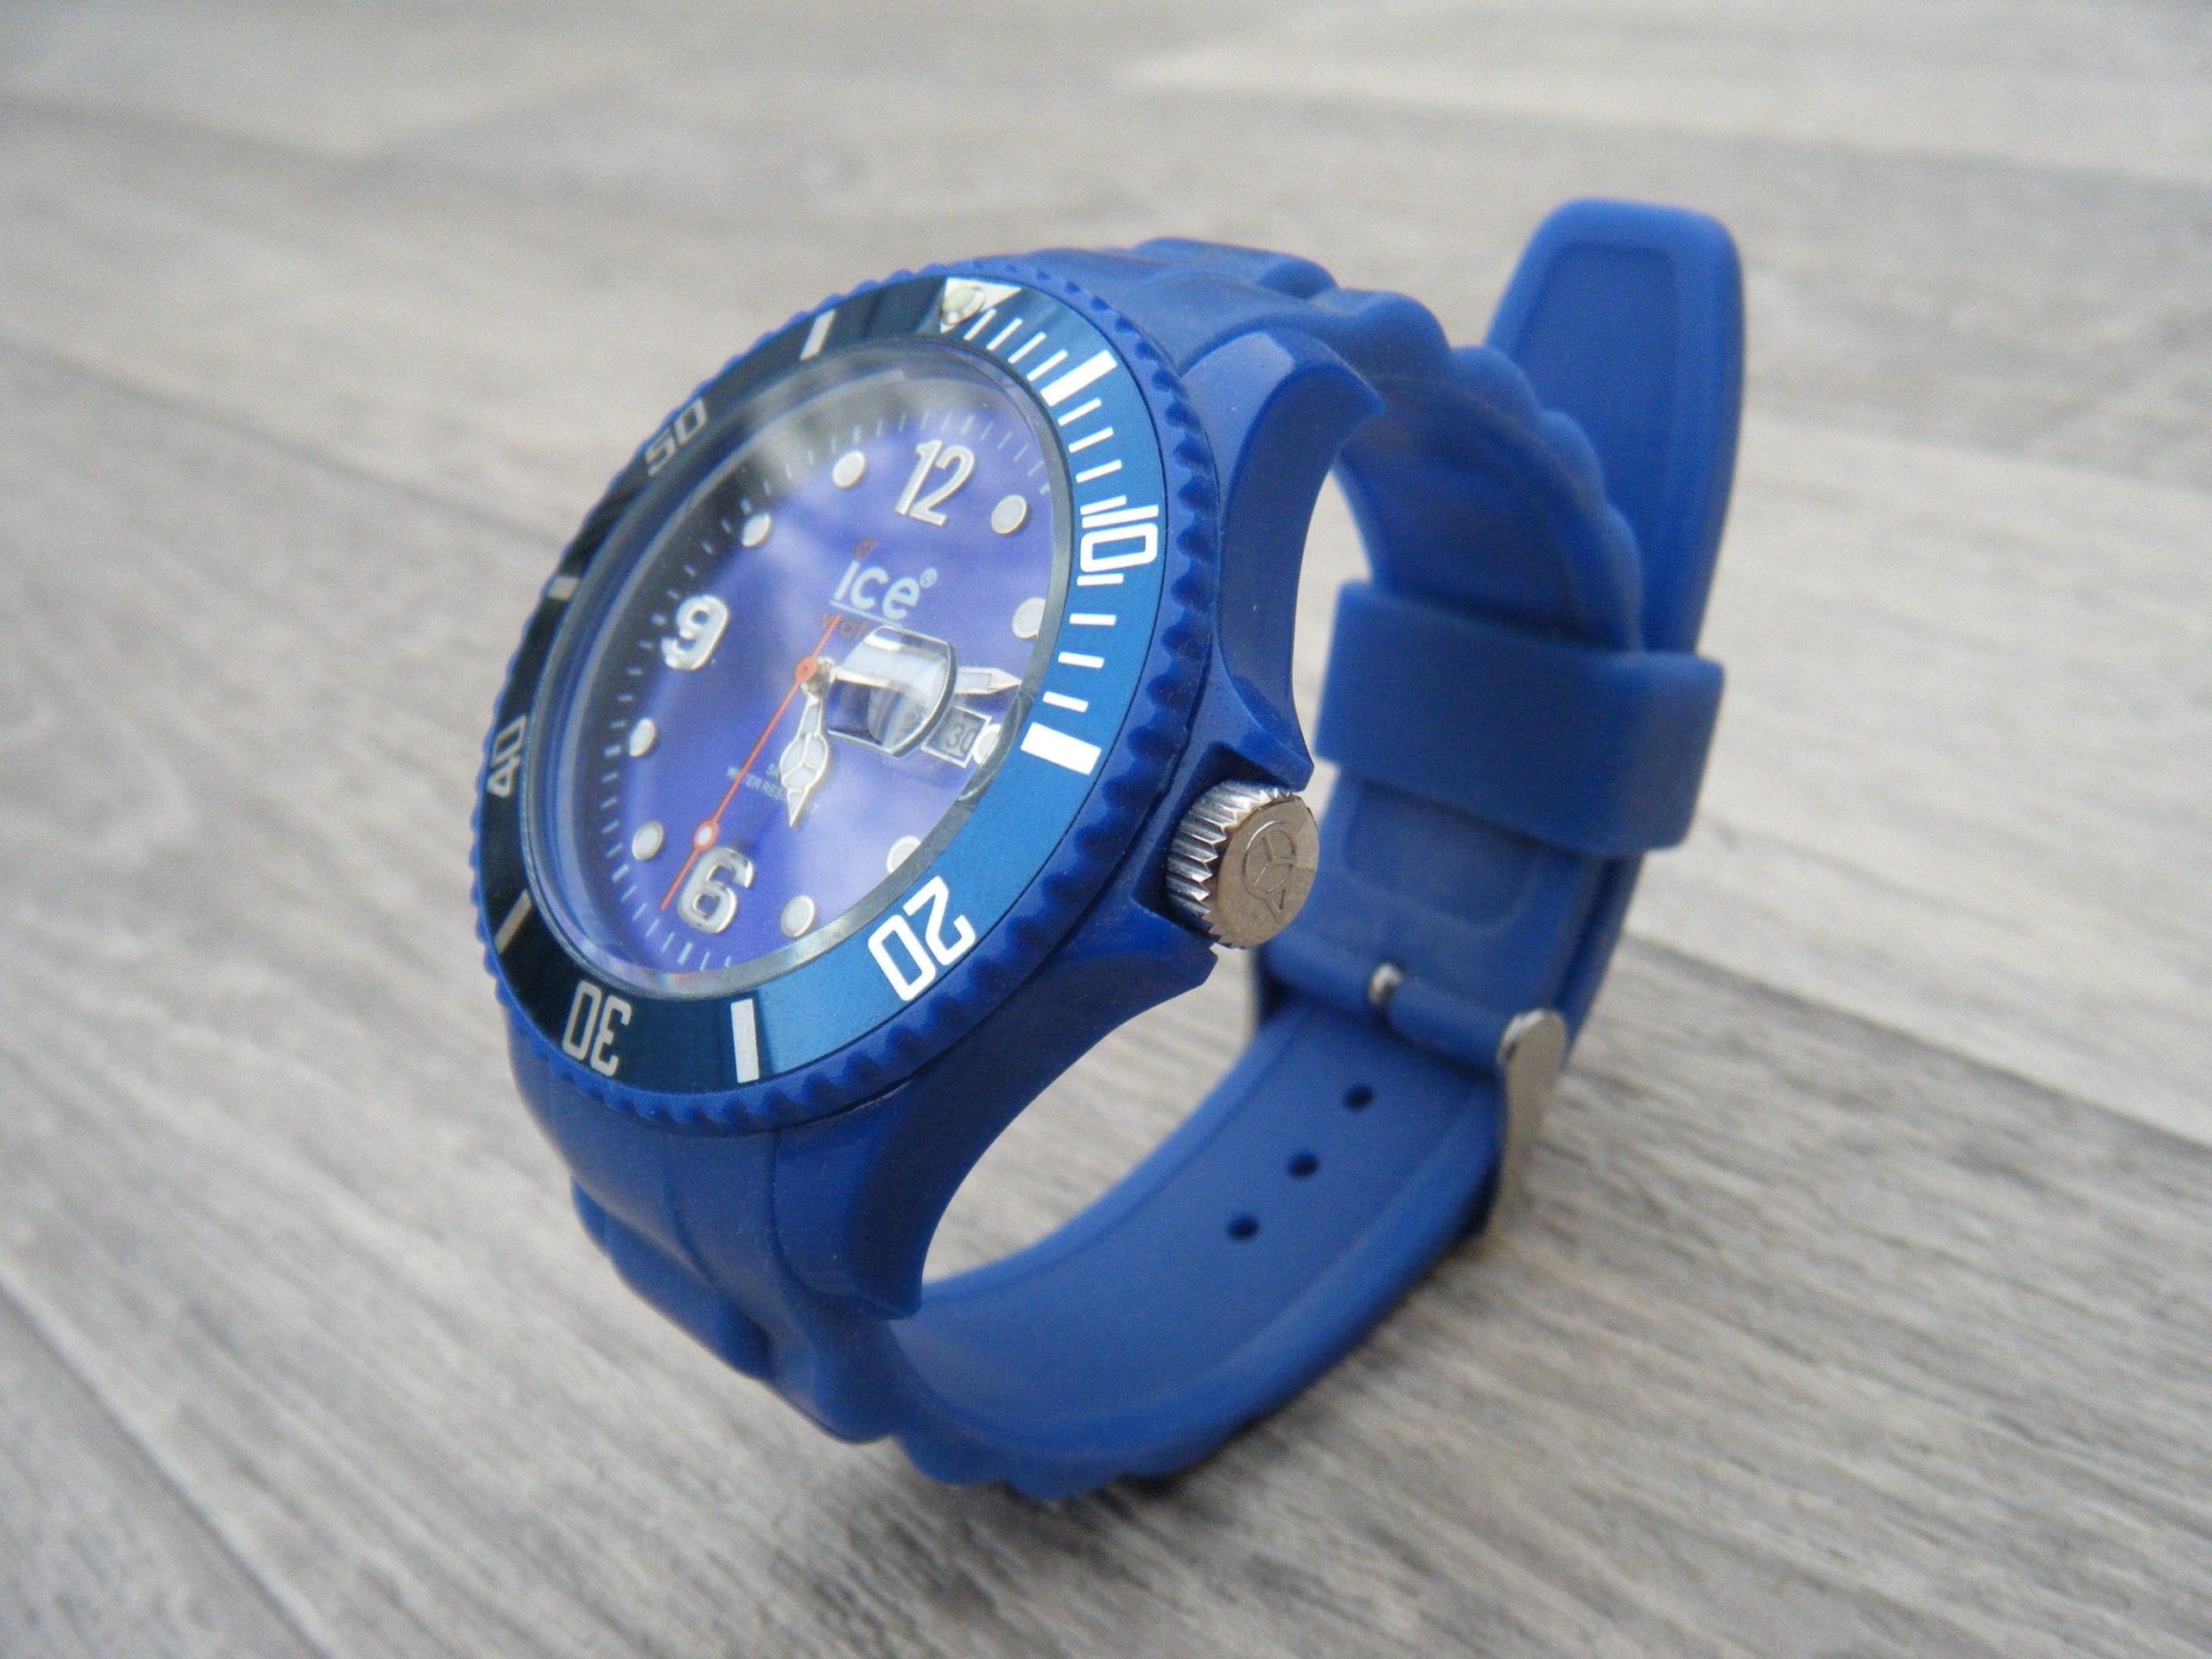 Montre ice watch homme bleu - Montre ice watch bleu turquoise ...